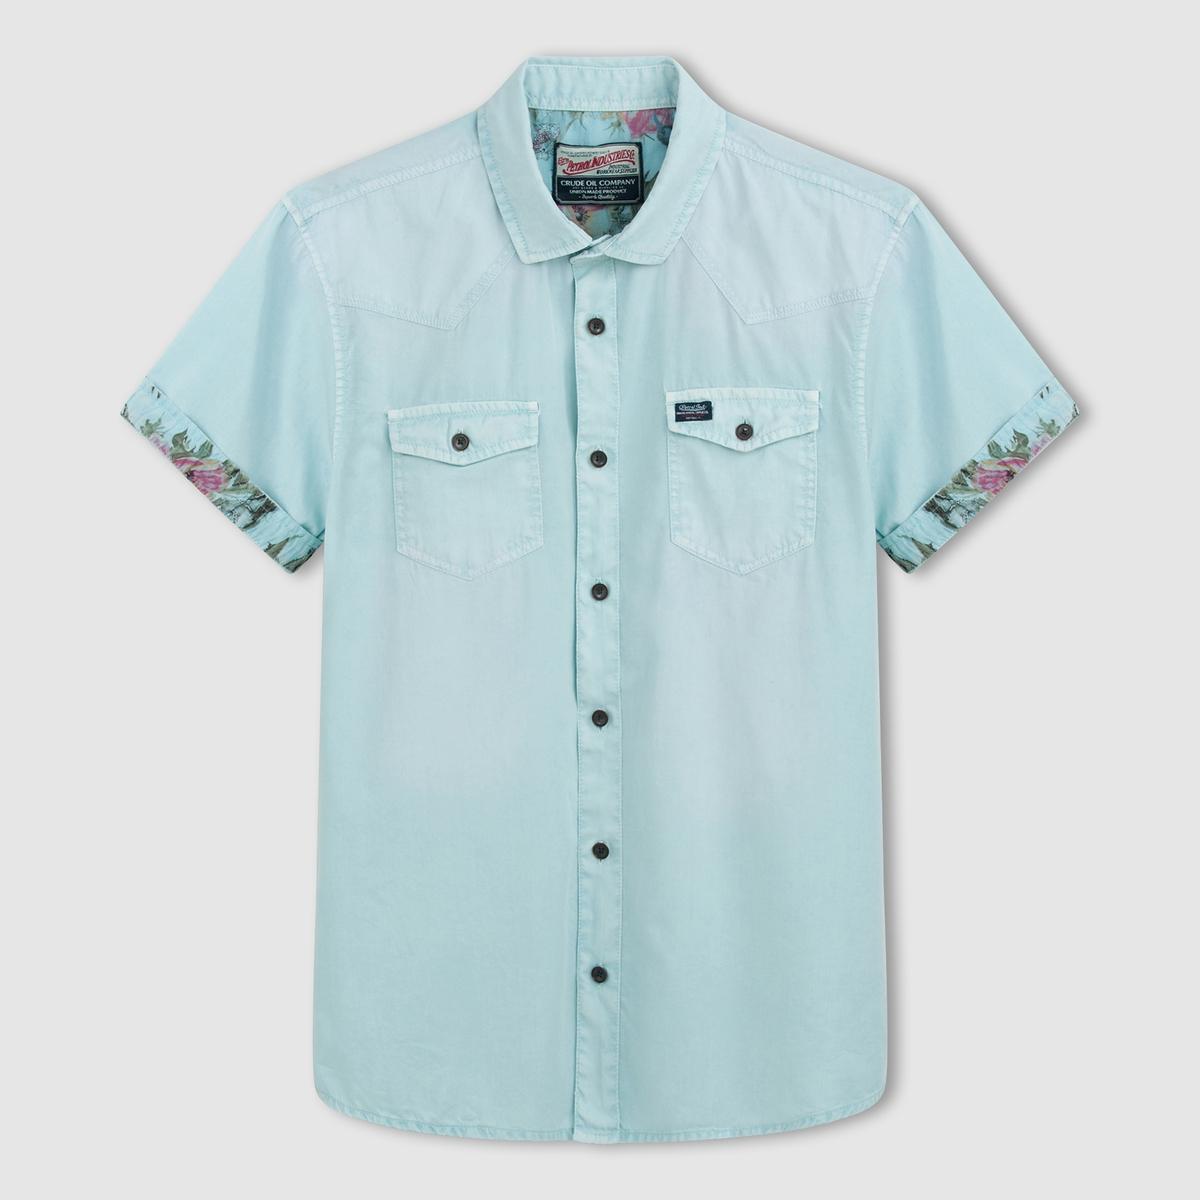 Рубашка с короткими рукавамиСостав и описание :Материал : 100% хлопкаМарка : PETROL INDUSTRIES.<br><br>Цвет: бирюзовый<br>Размер: XS.S